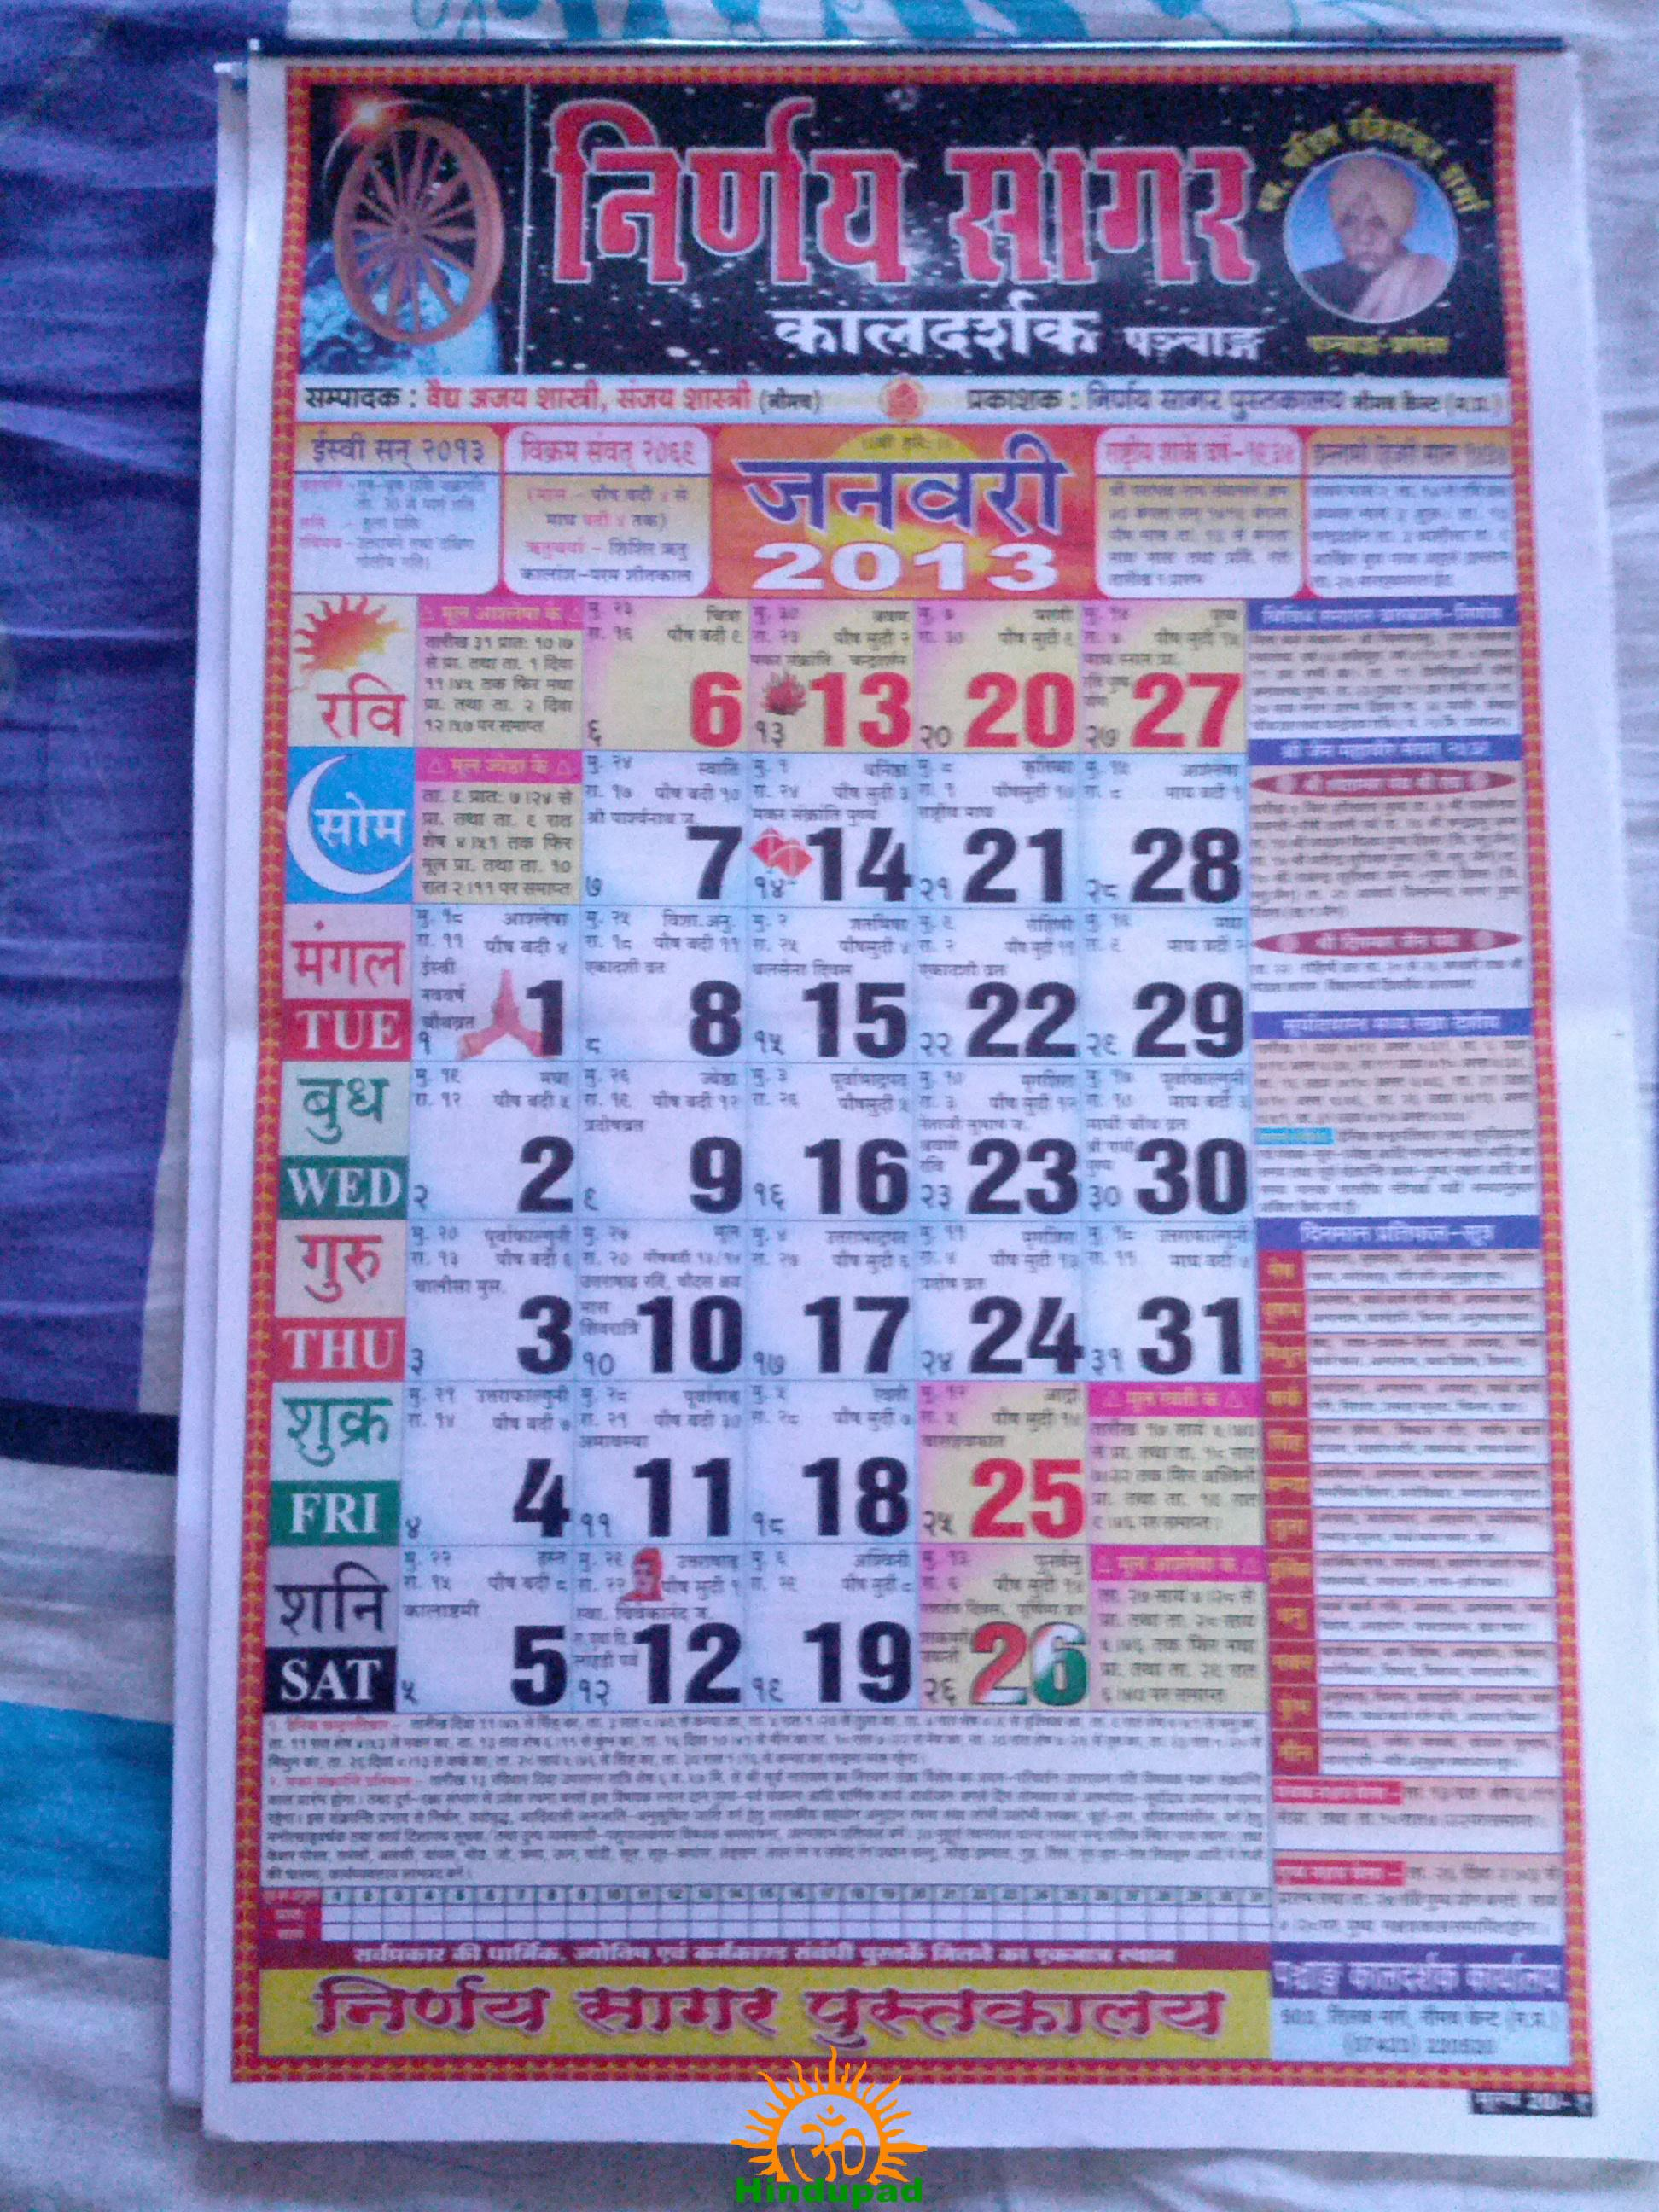 Vikram Samvat 2014 Hindu Calendar Images | TheCelebrityPix